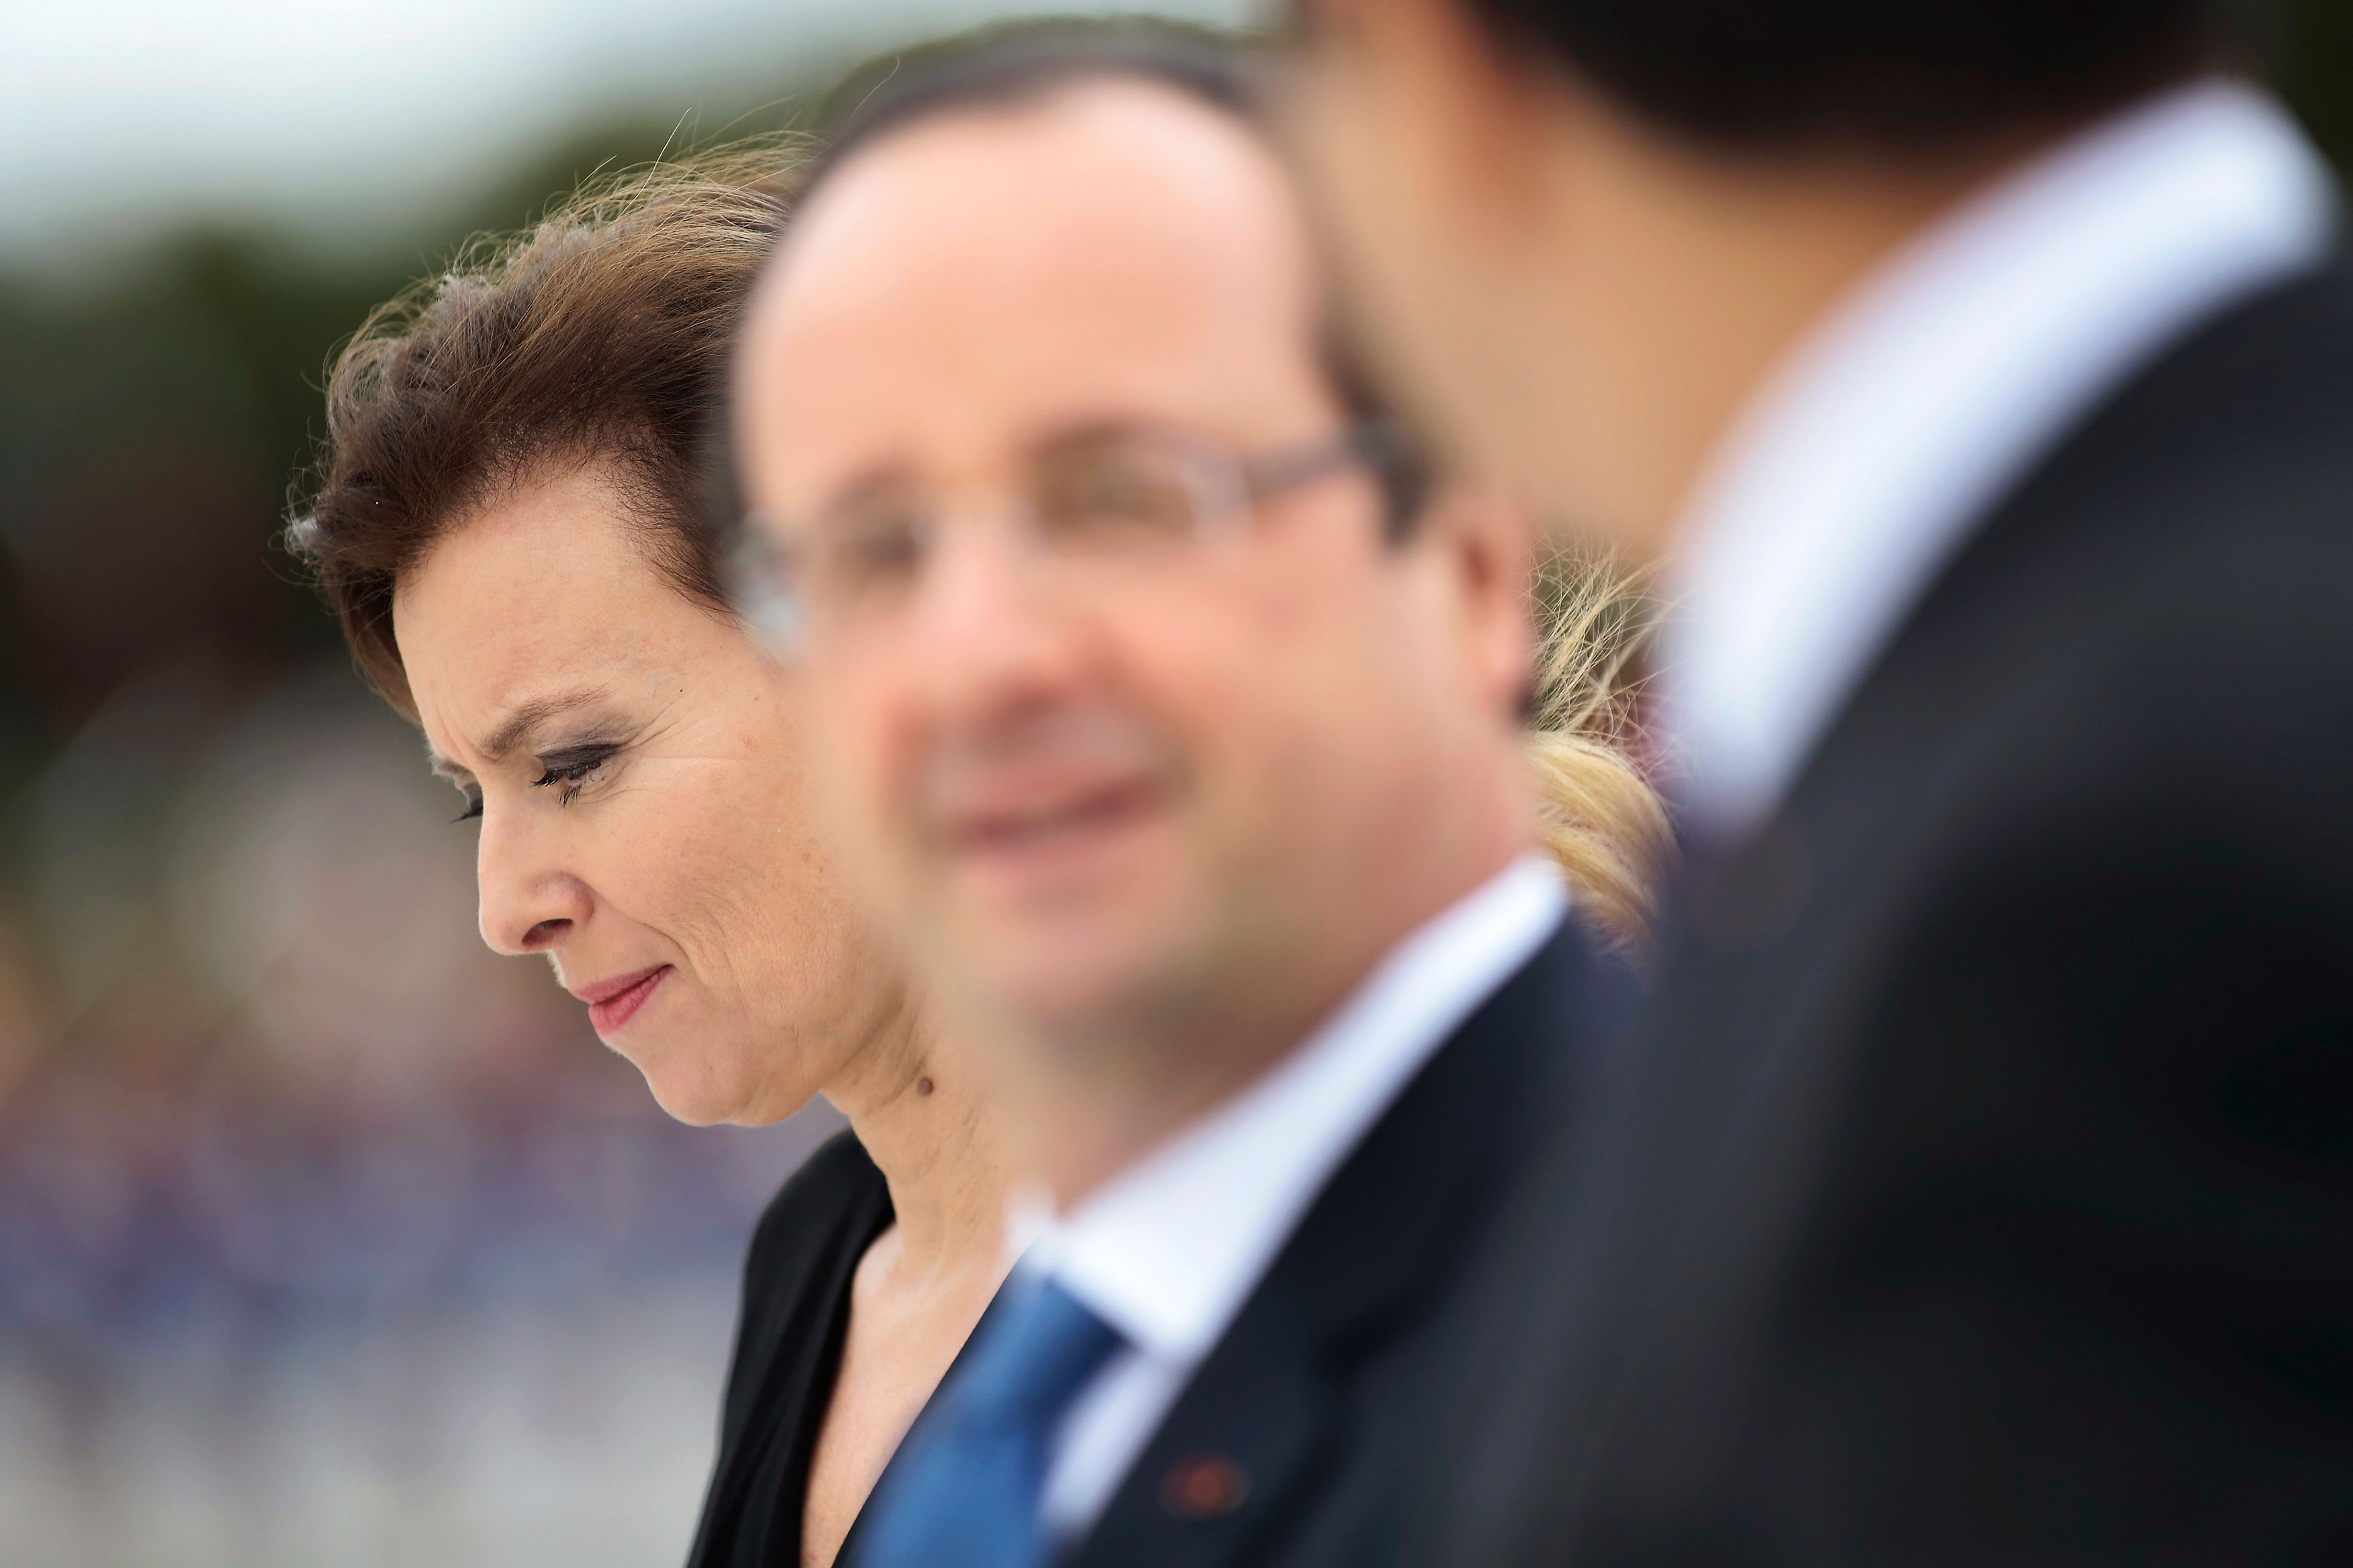 Valérie Trierweiler et François Hollande ont rompu